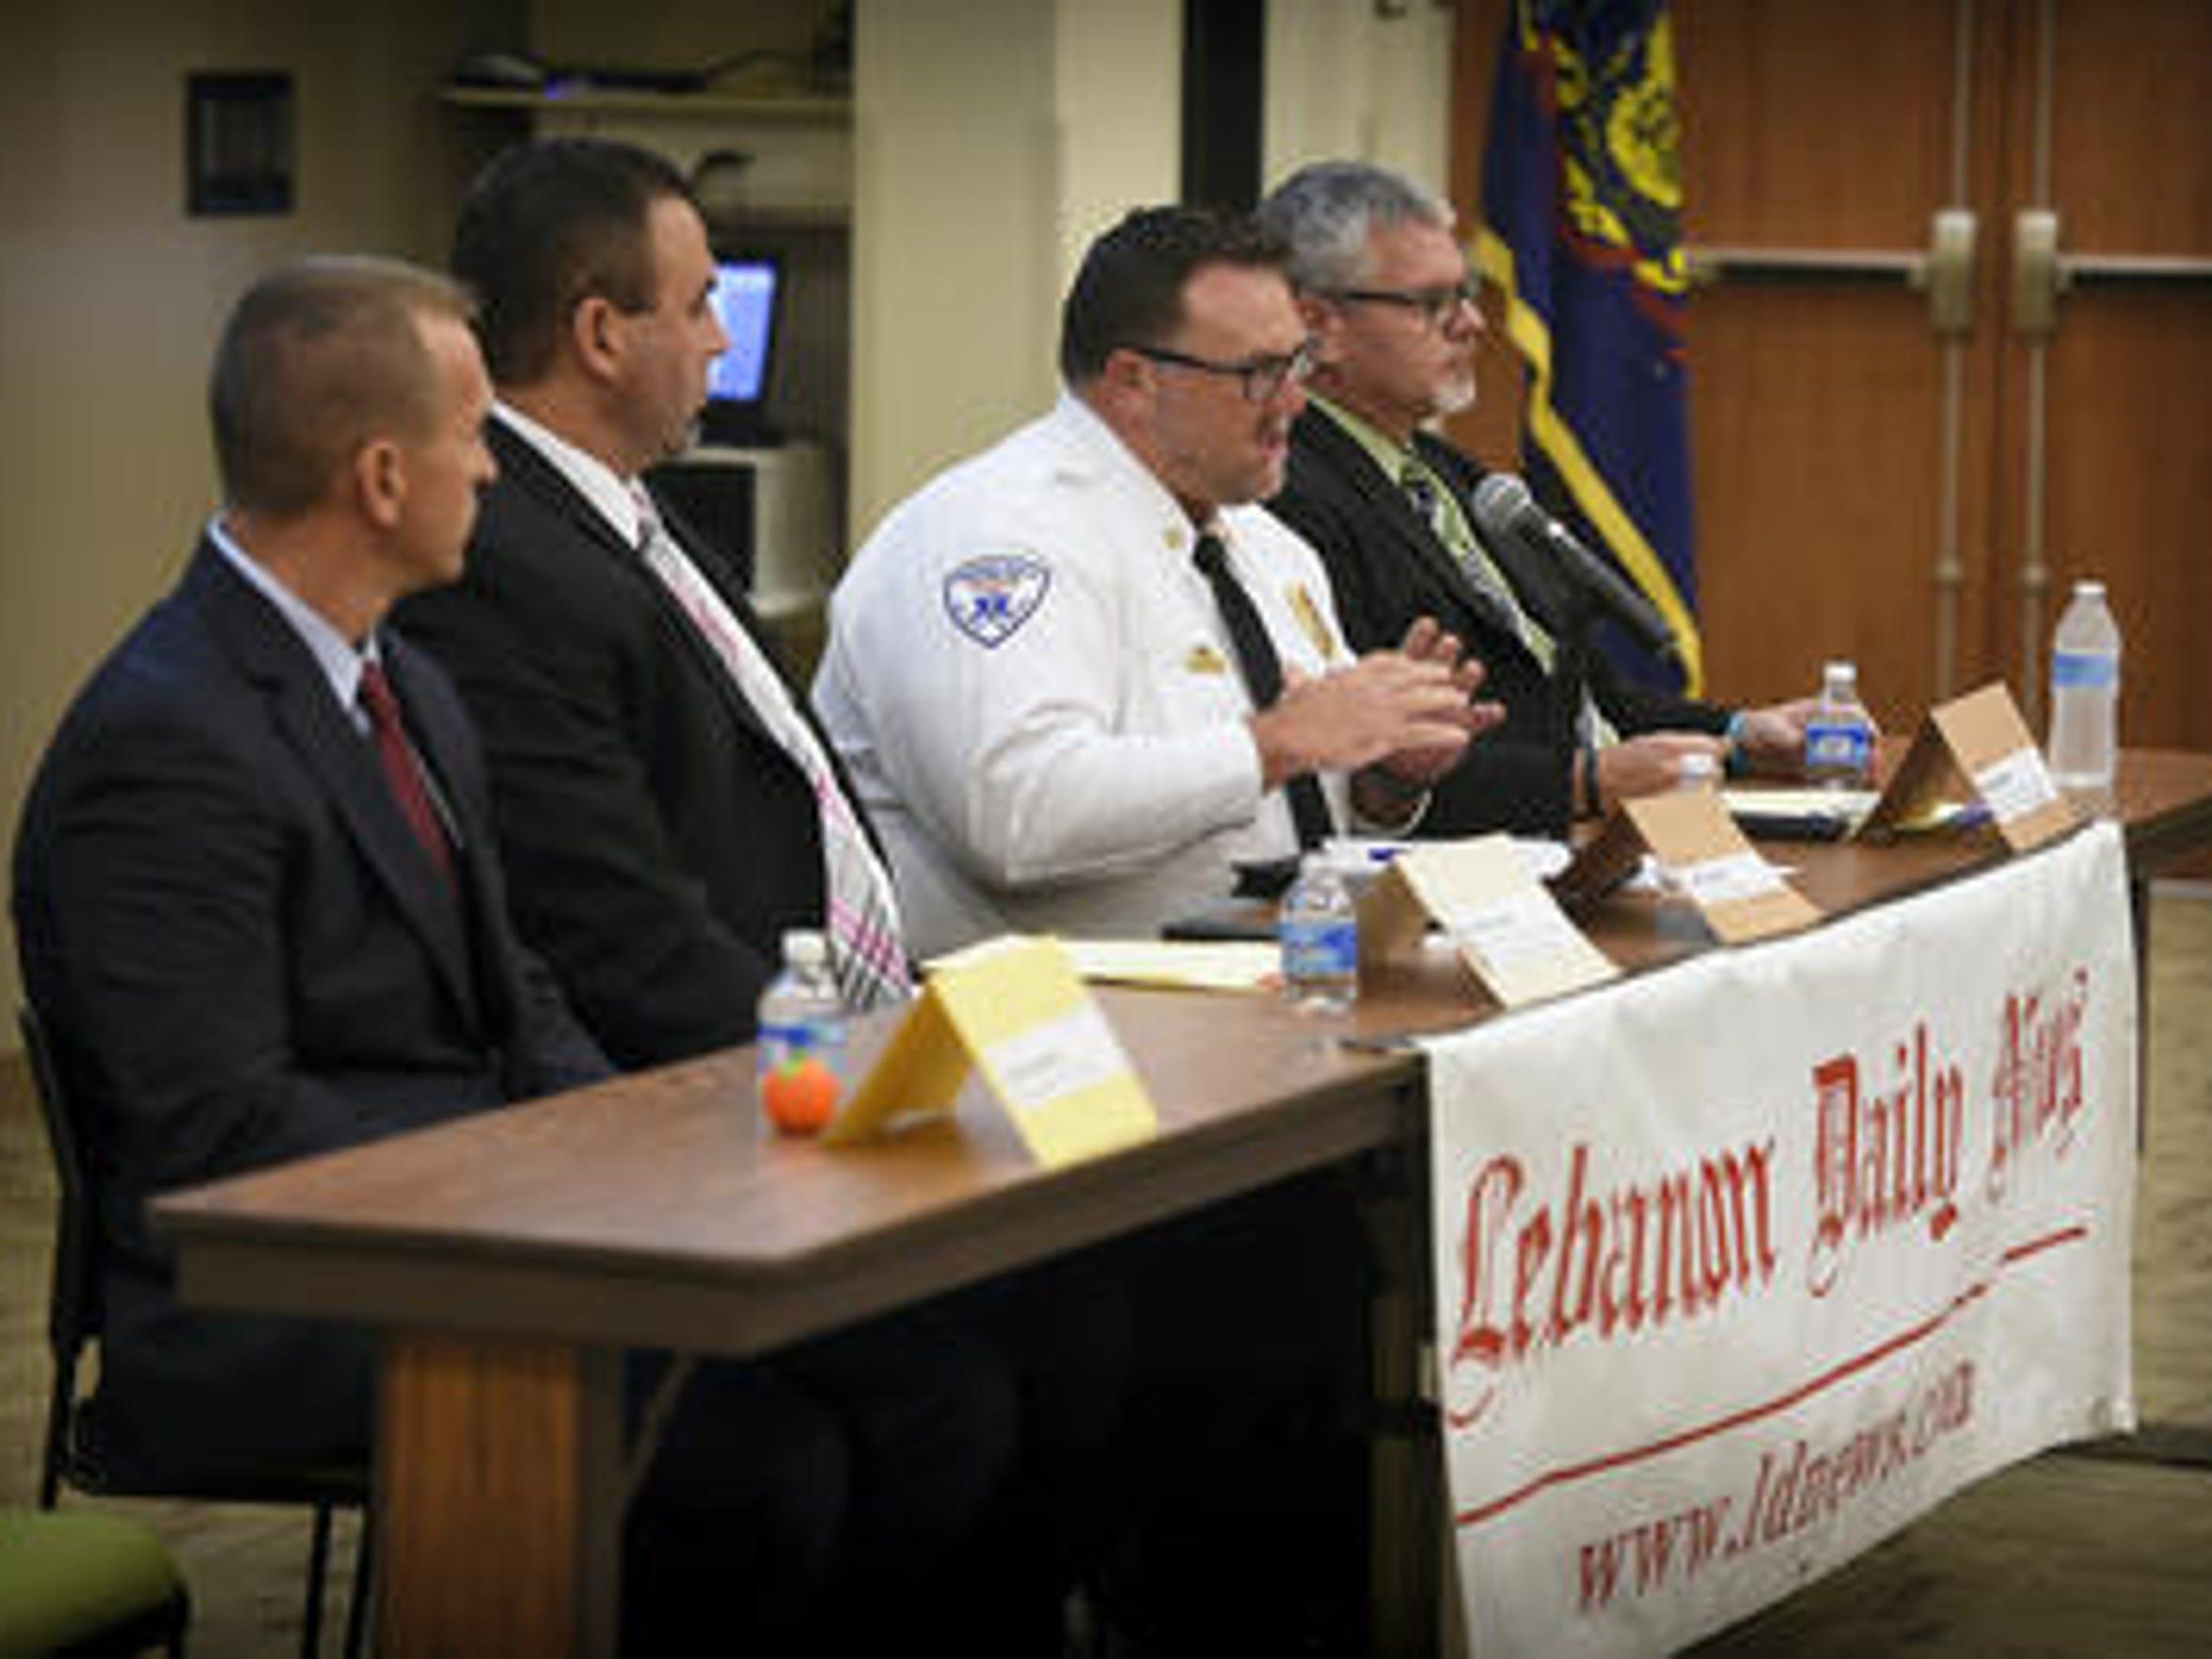 Panelists, from left, David Arnold, Lebanon County